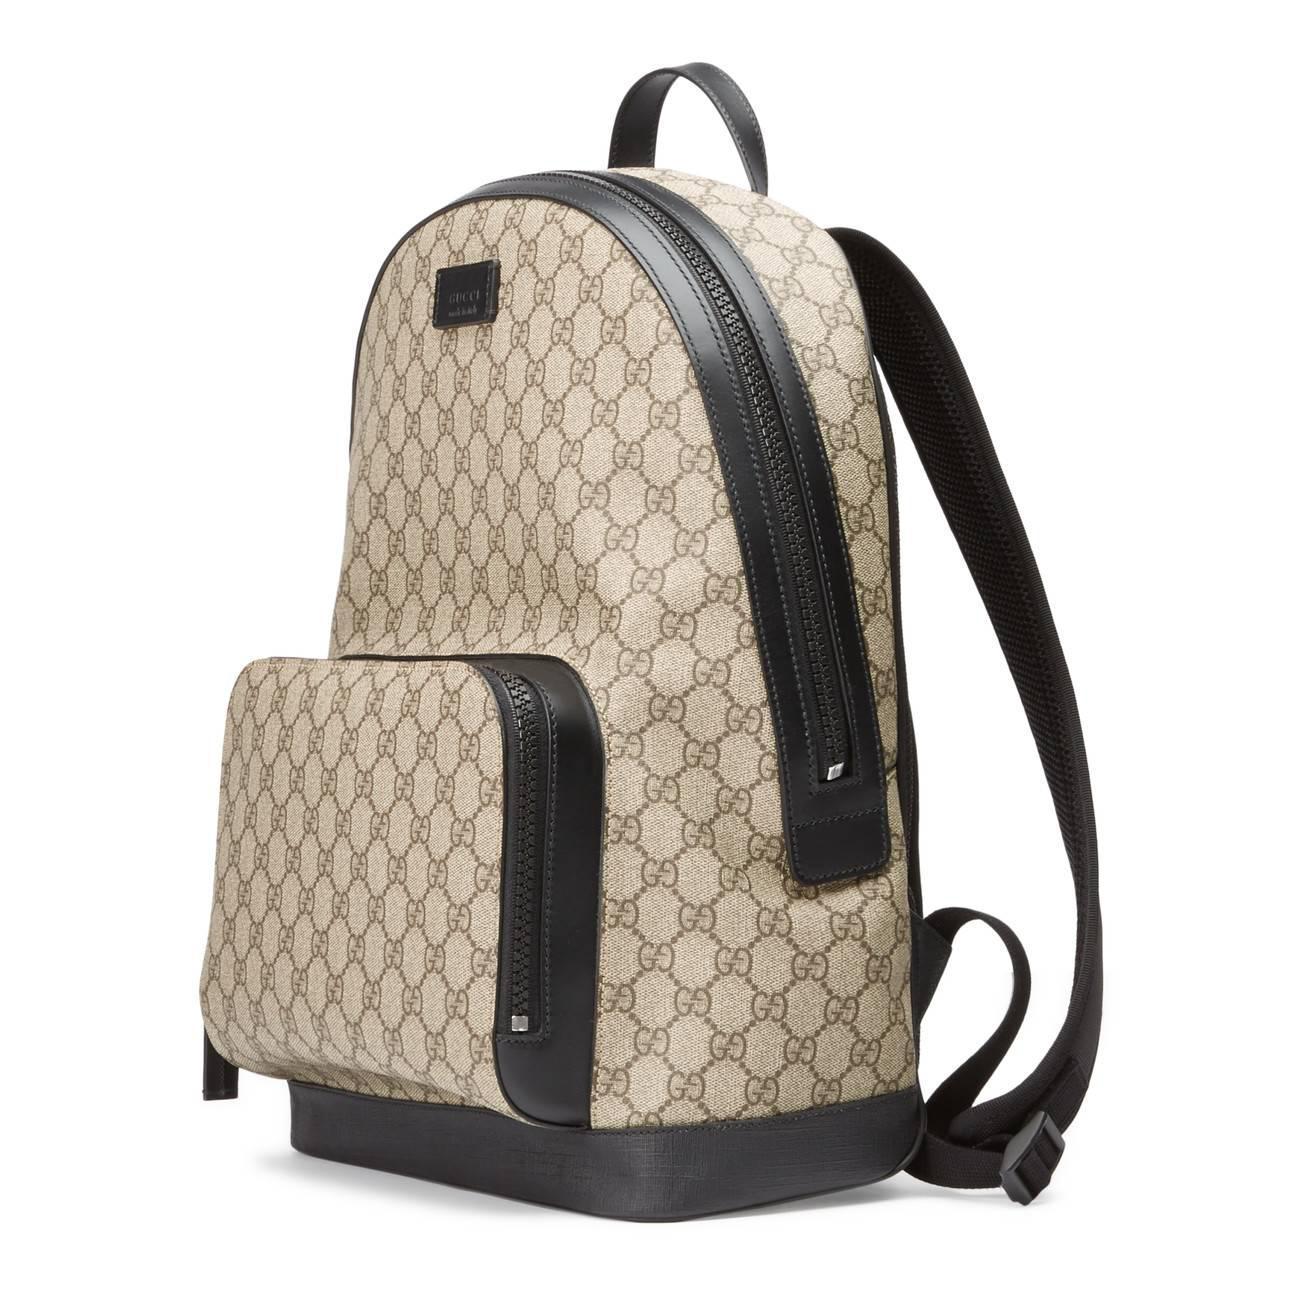 8e05758109d Gucci - Natural GG Supreme Backpack - Lyst. View fullscreen